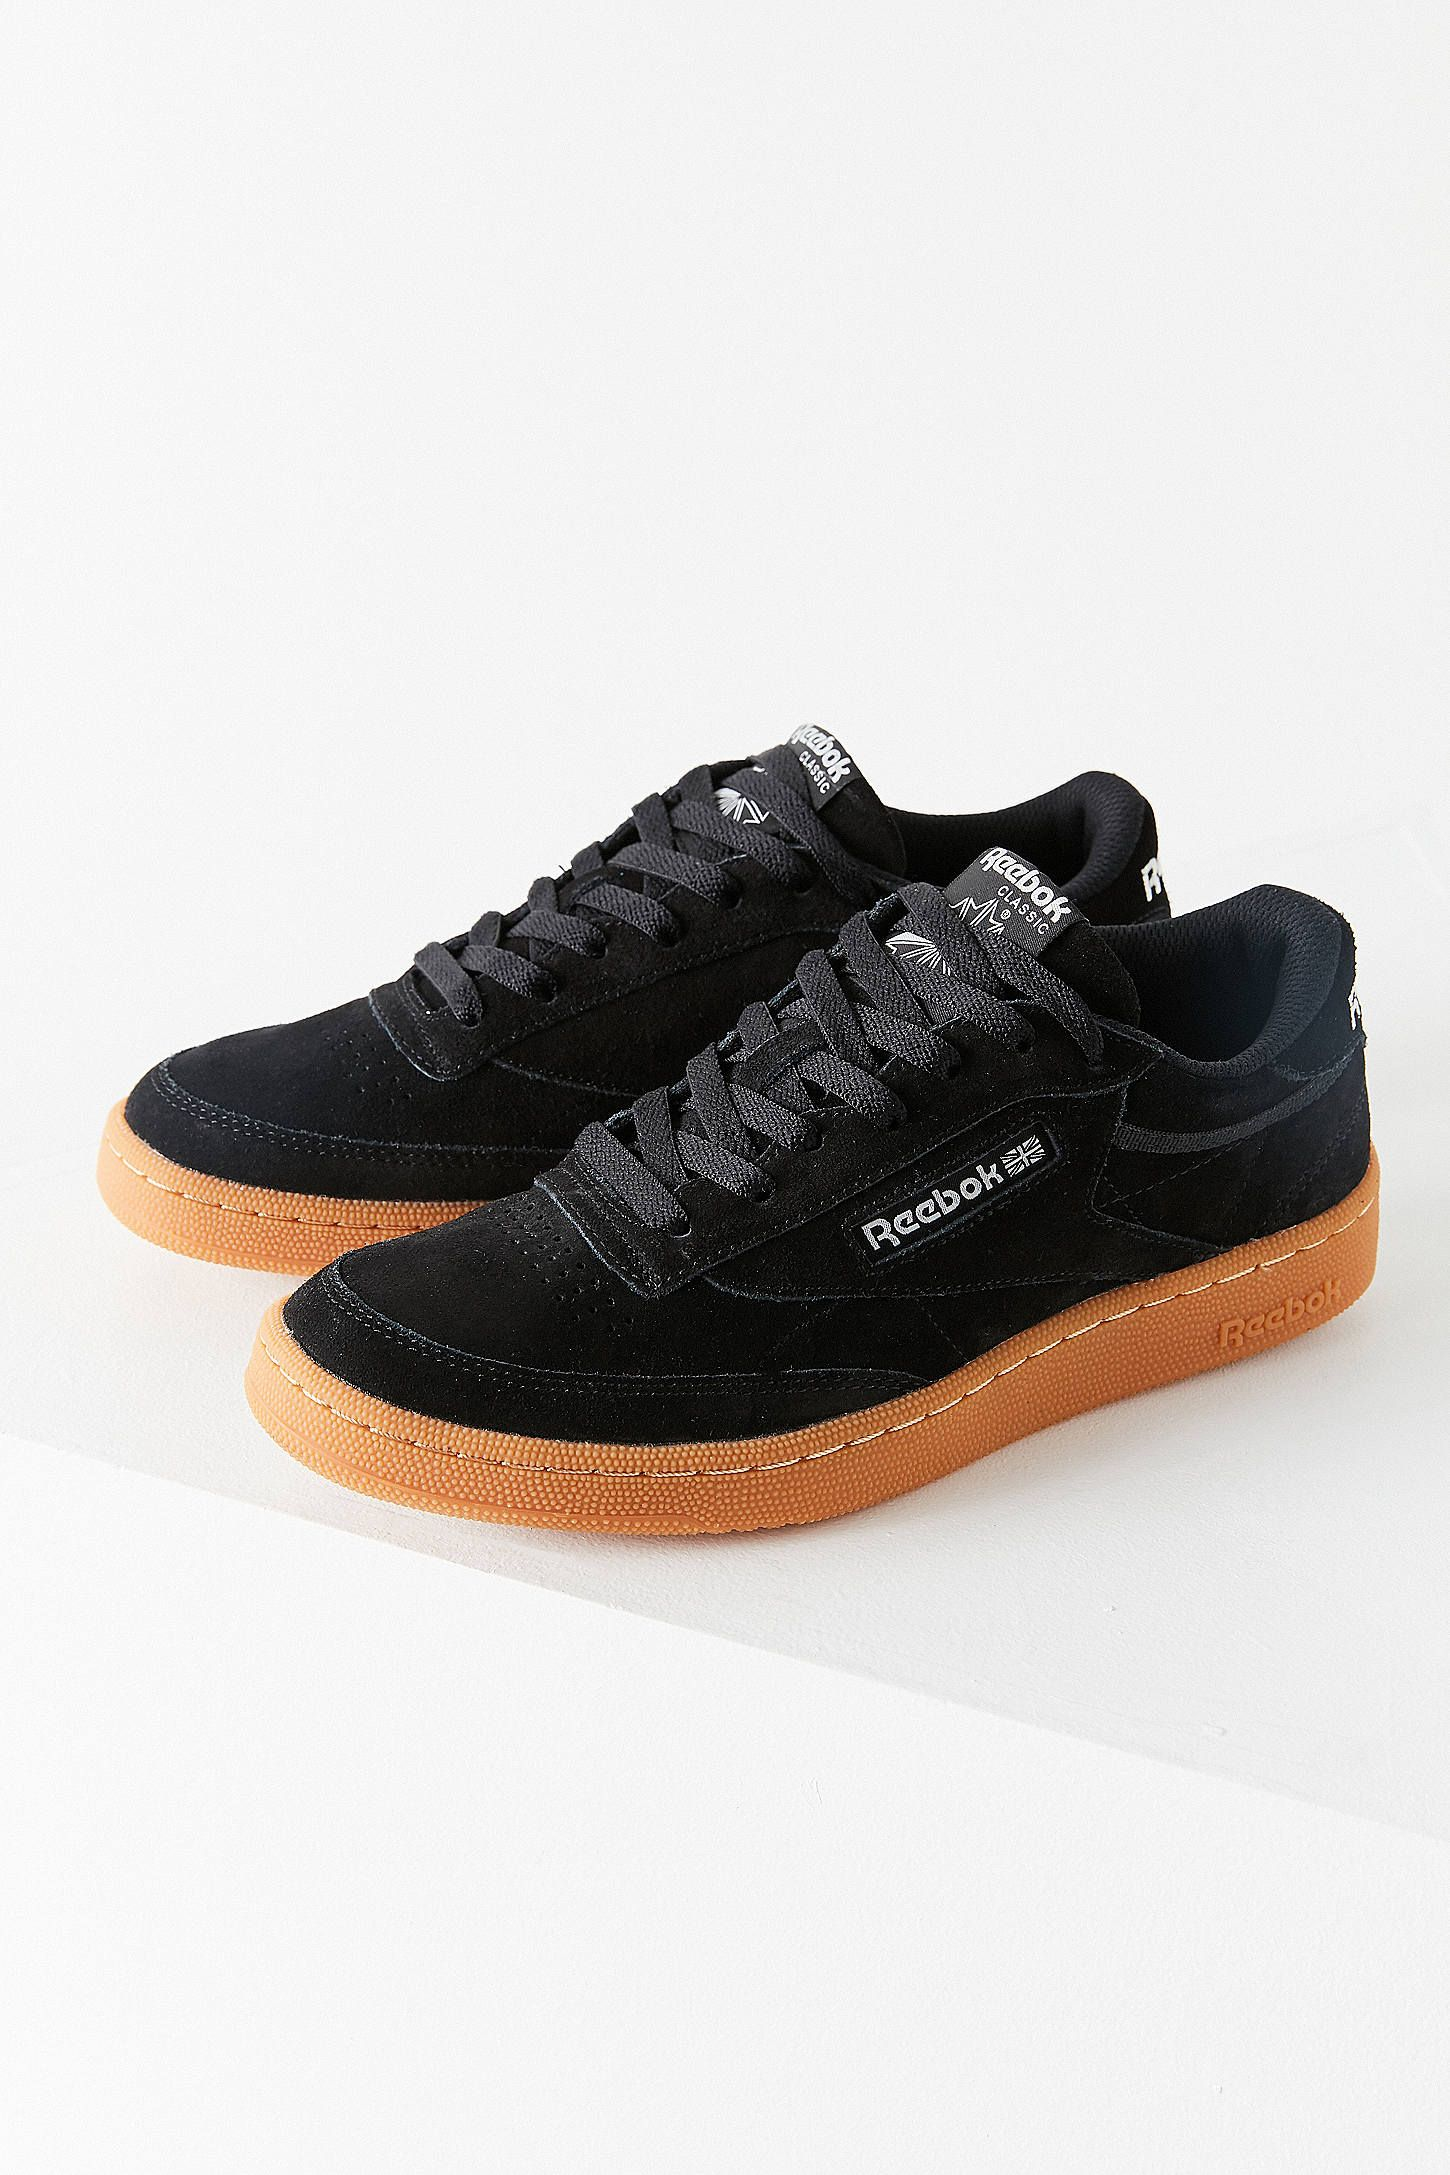 c8951bf9b Reebok Club C 85 MS Gum Sole Sneaker | Style | Reebok club c, Reebok ...